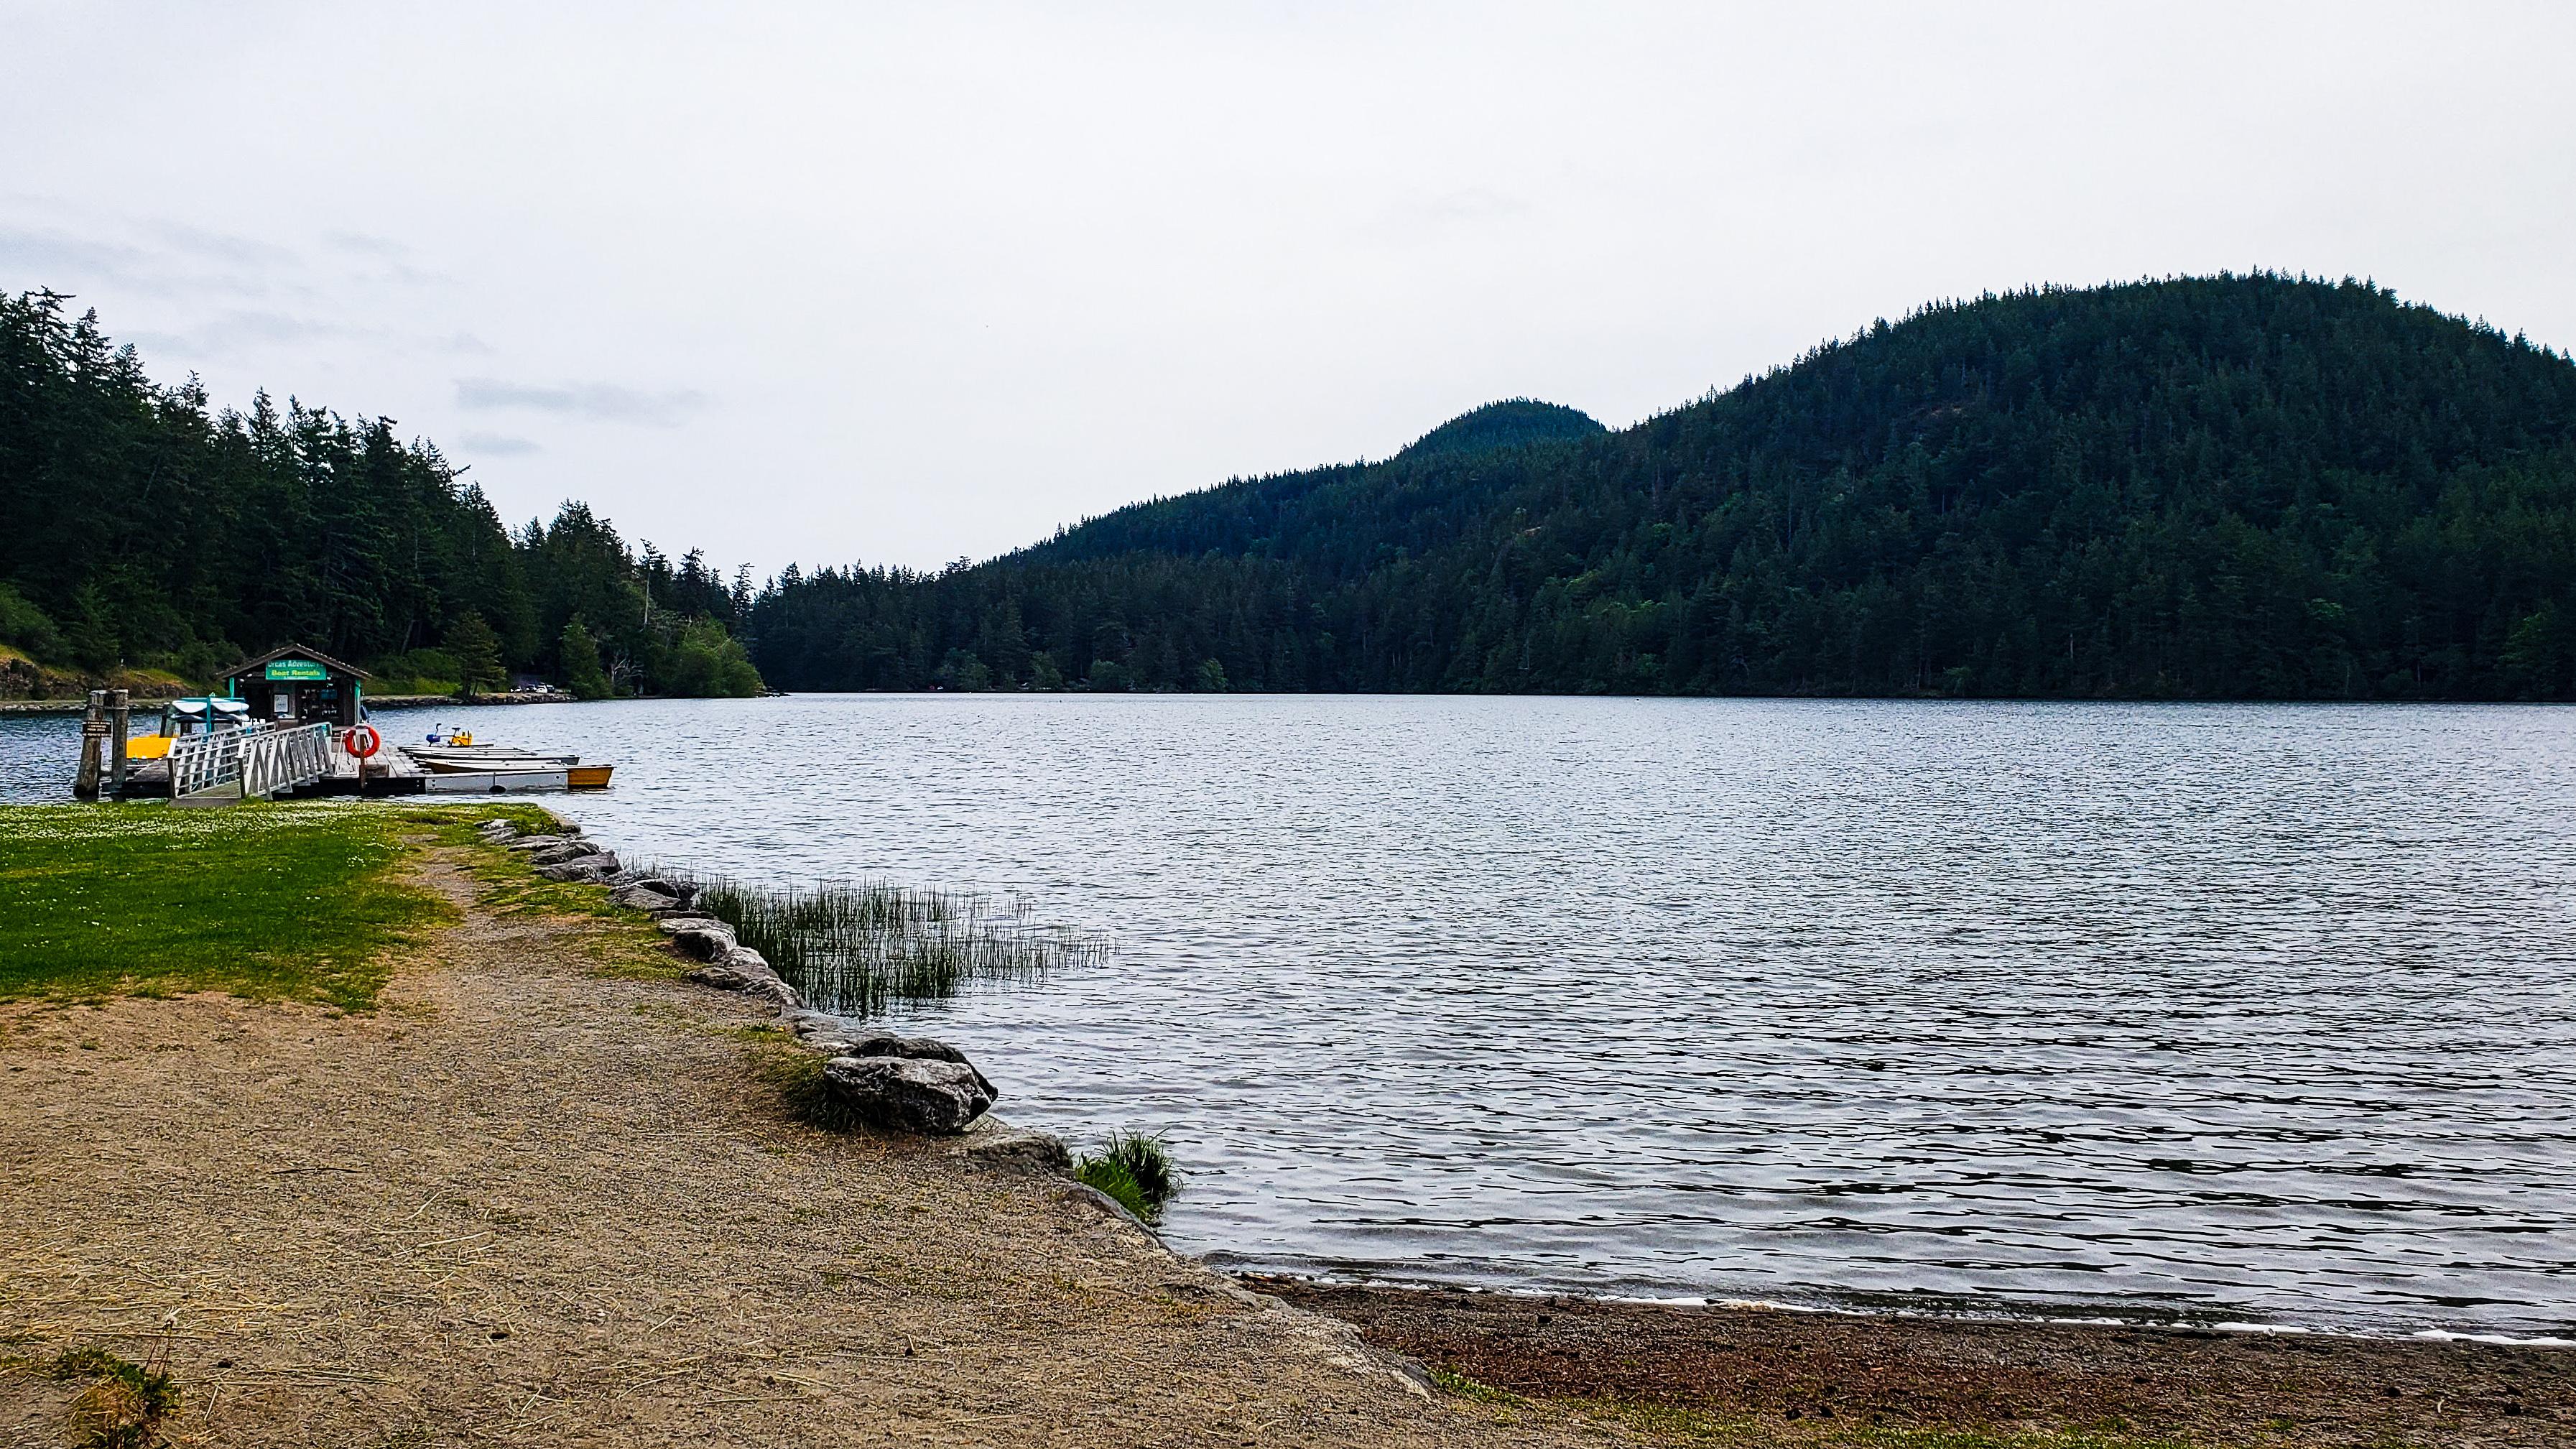 Moran State Park, Washington